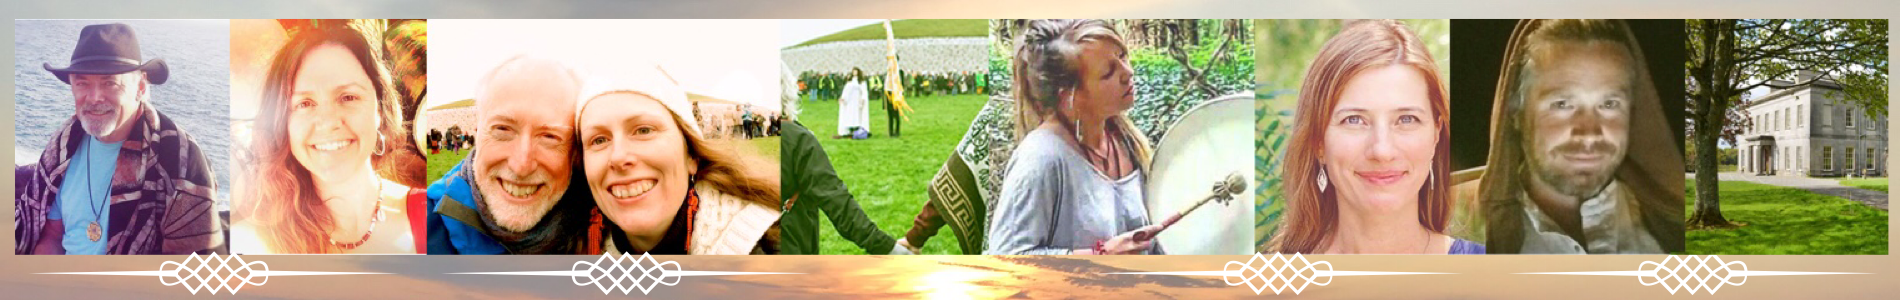 v2-uzorchik-collage-line-up-solstice-2019-newgrange-ireland-event-winter-sun-sunset-shaman-elders-celtic-mythology.PNG